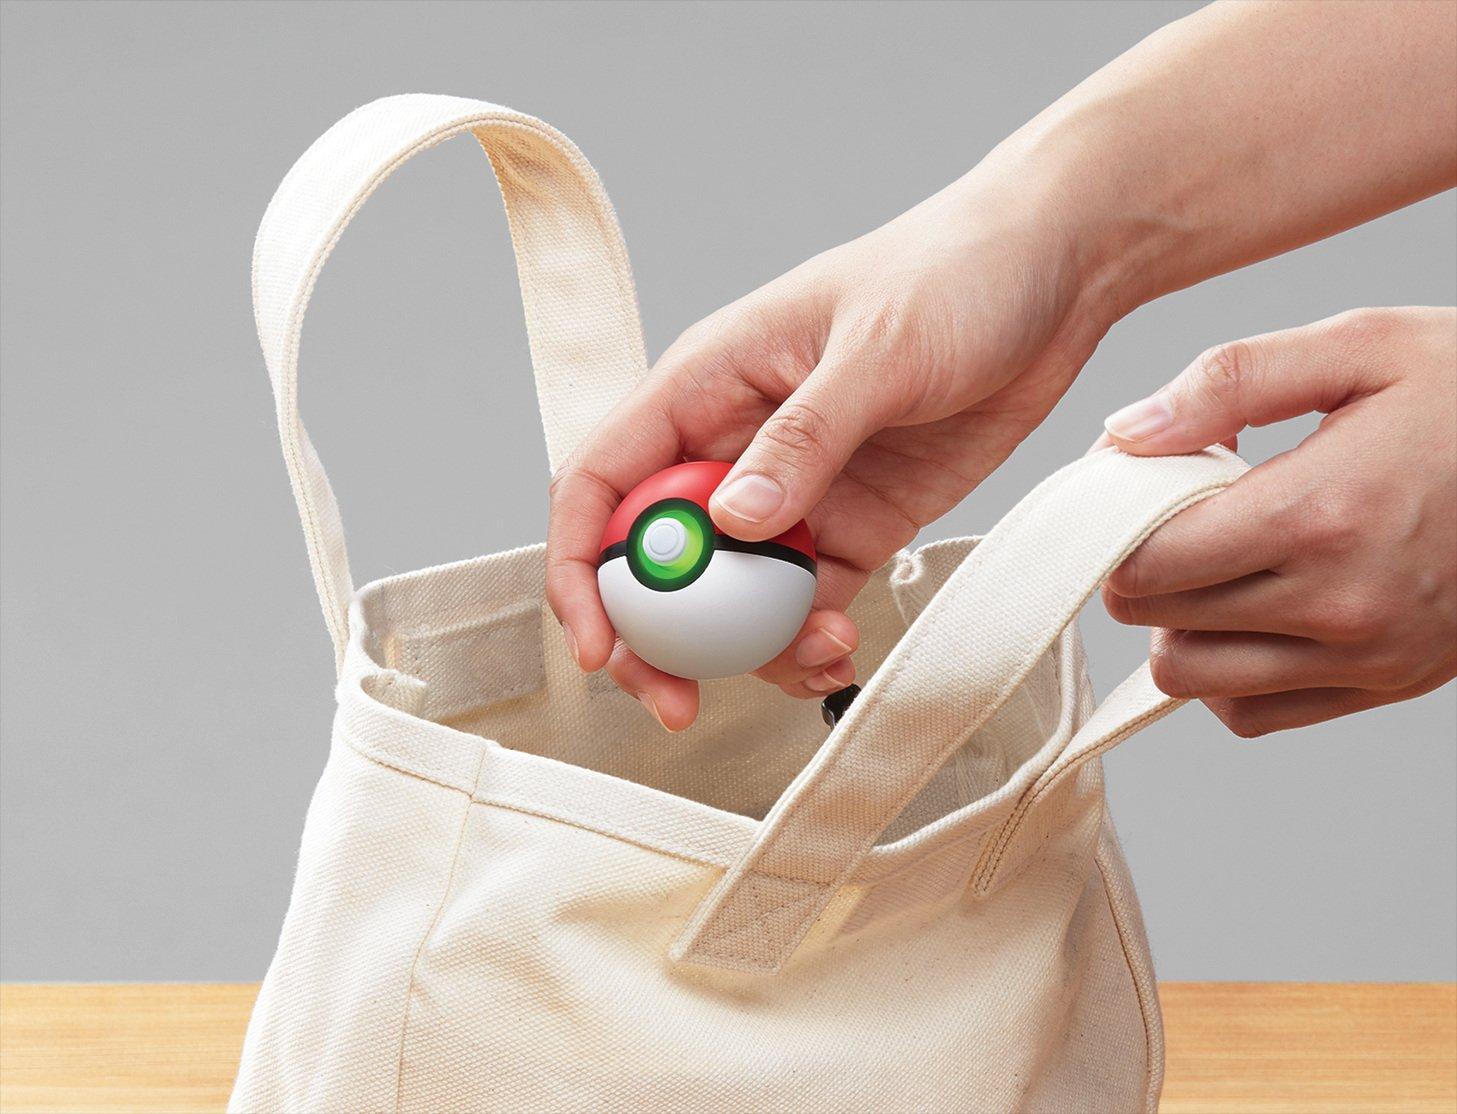 chequea3-como-funciona-el-nuevo-accesorio-poke-ball-plus-frikigamers.com